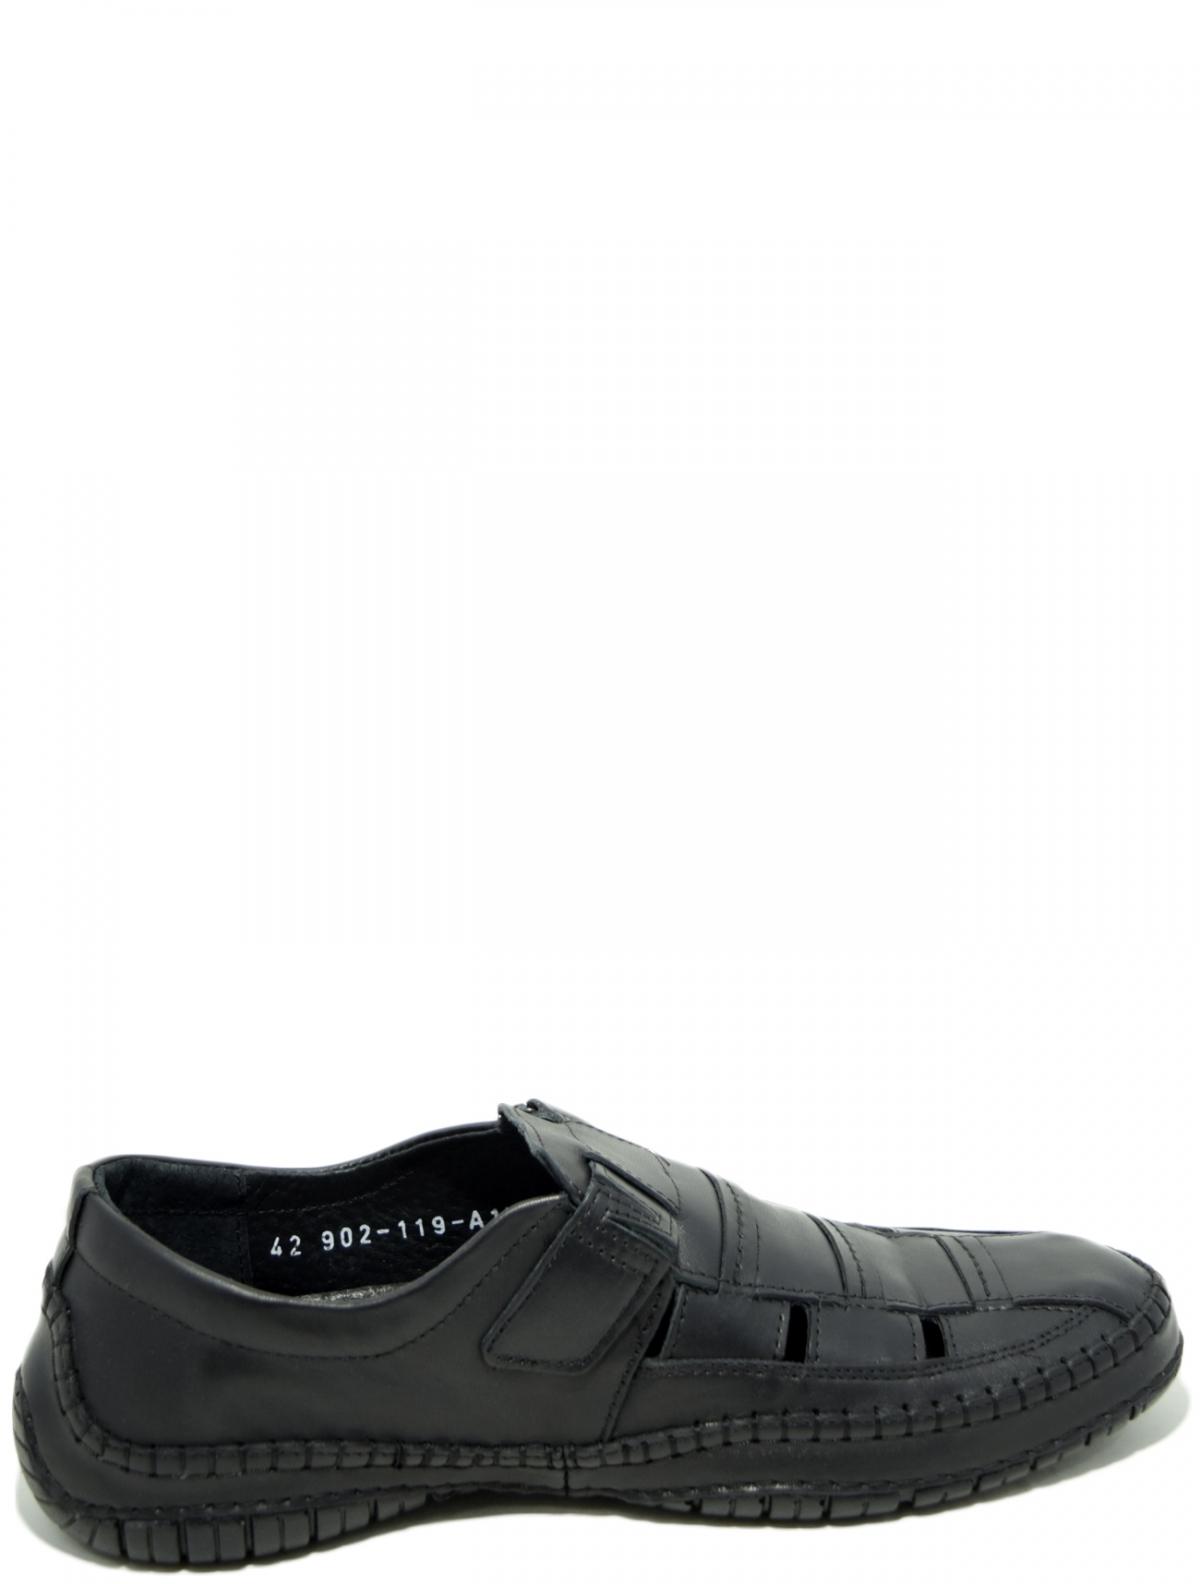 Rooman 902-119-A1L мужские туфли